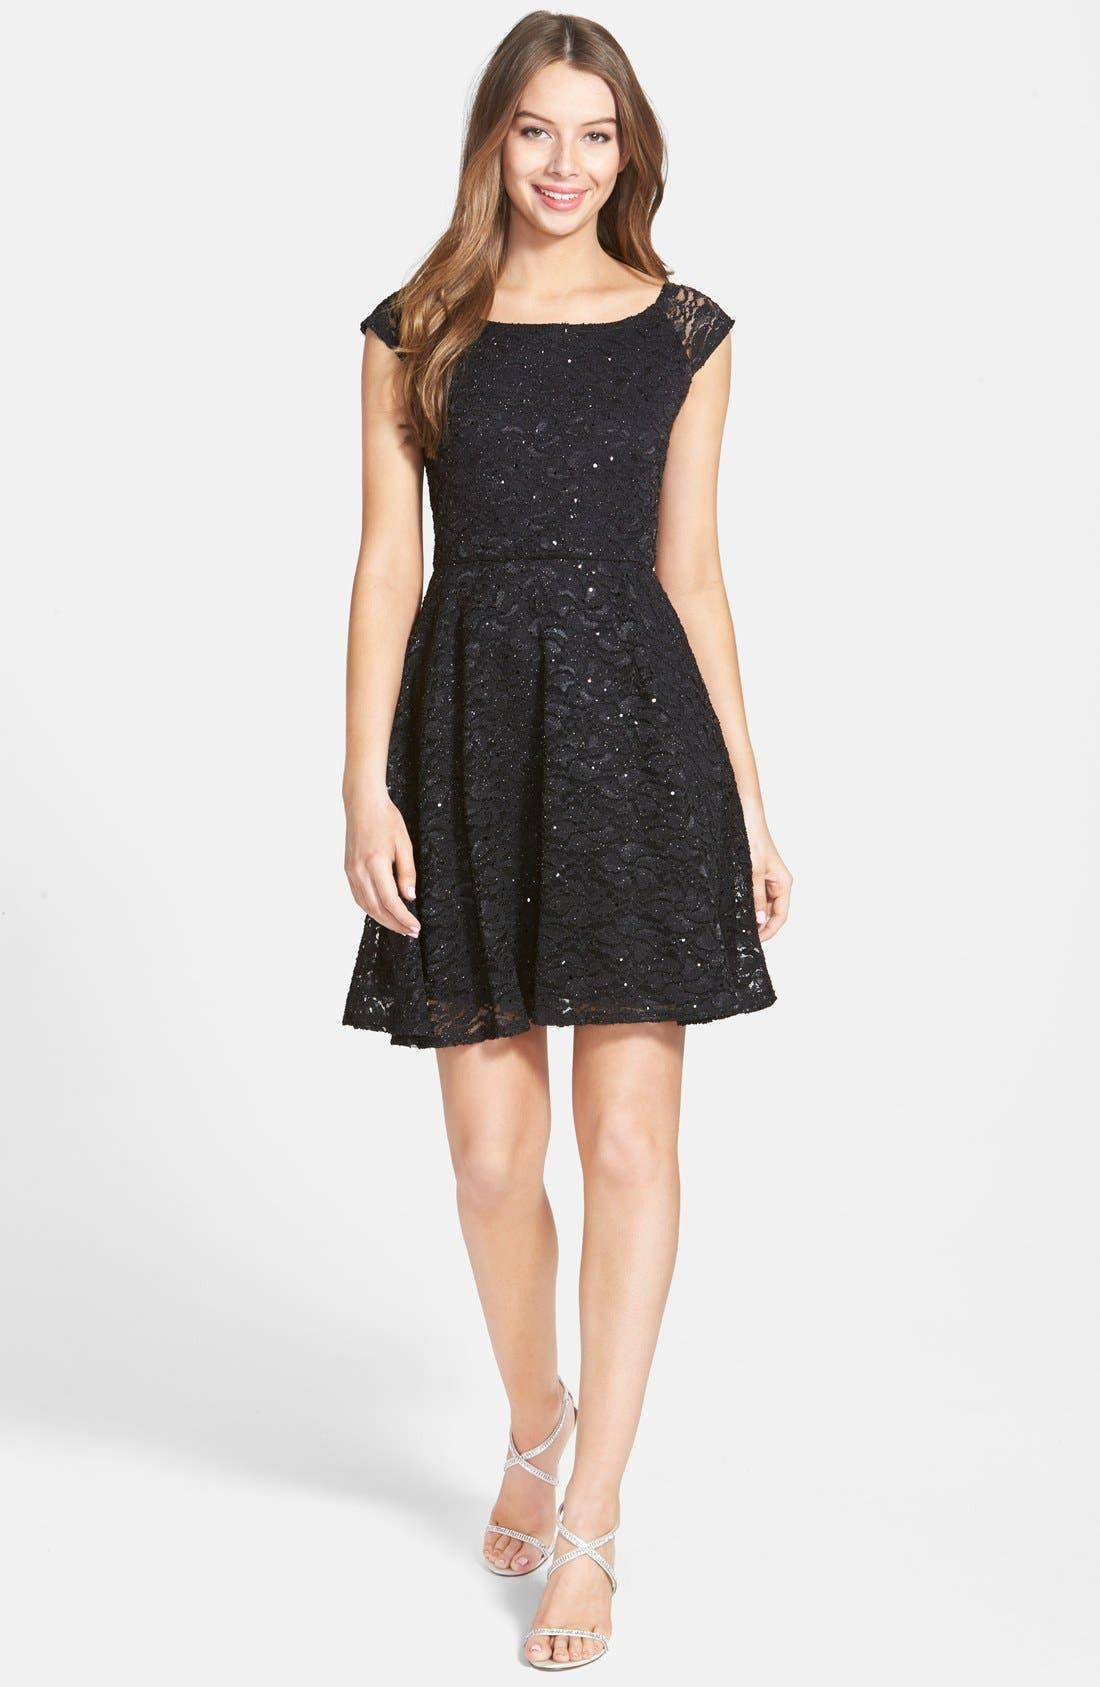 Alternate Image 1 Selected - Jump Apparel Glitter Lace Cap Sleeve Skater Dress